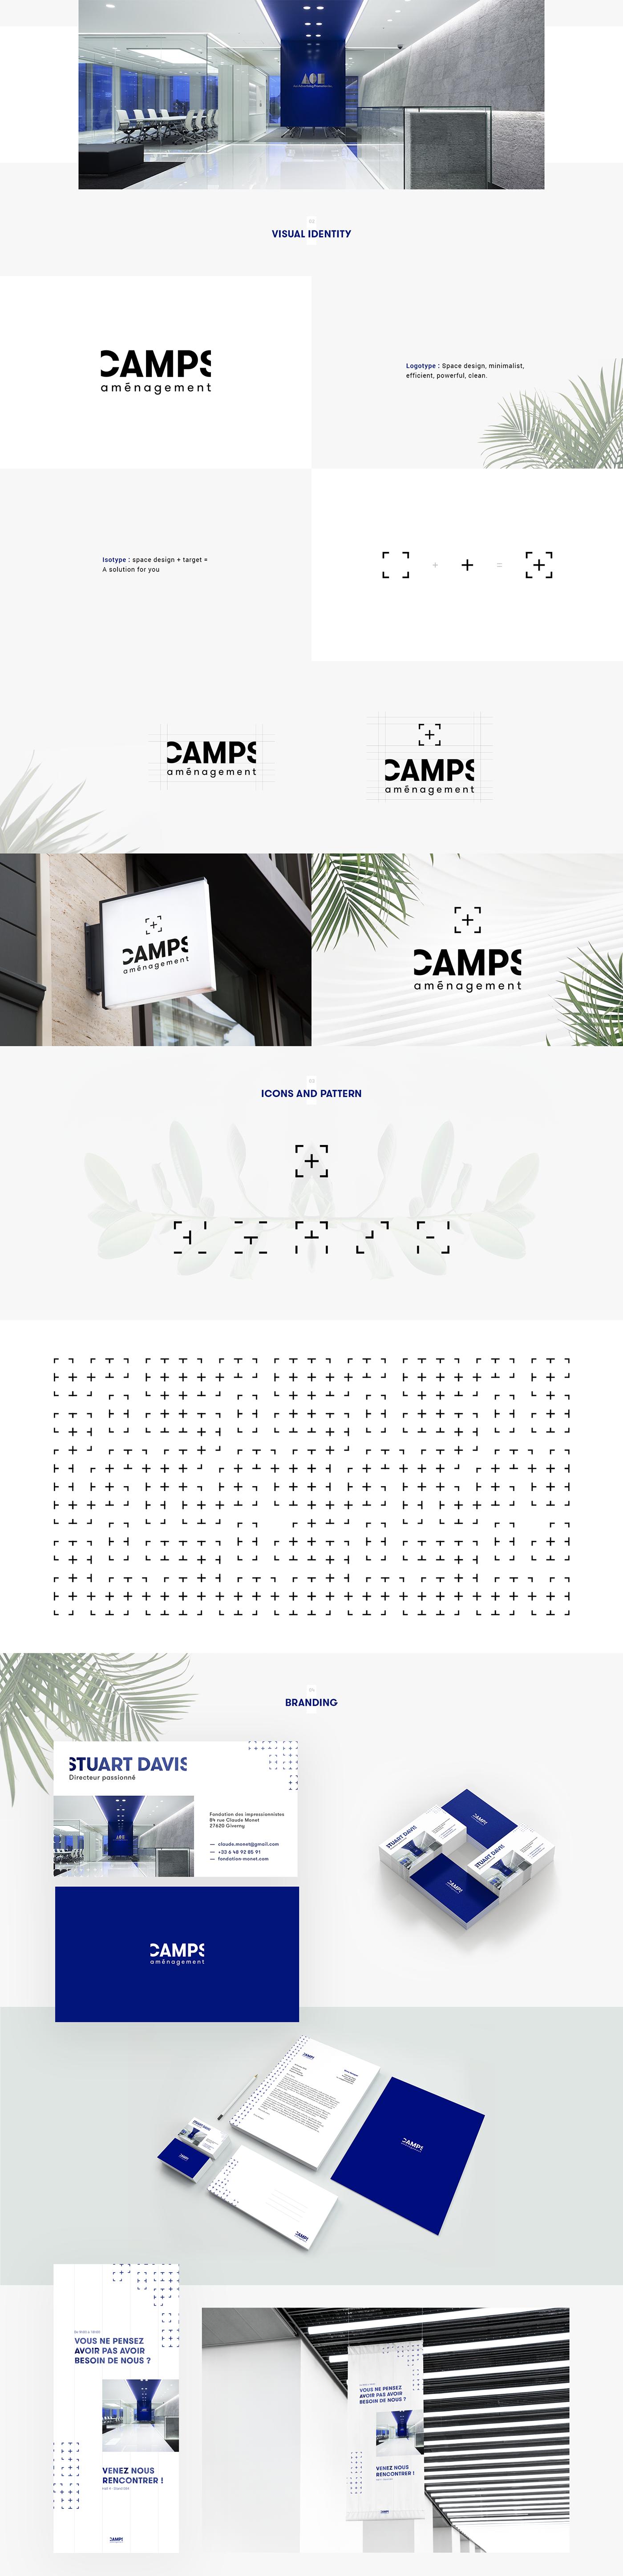 logo,vegetable,jungle leaves,artchitecture,interior design ,Office,company,employee,comfort,identity